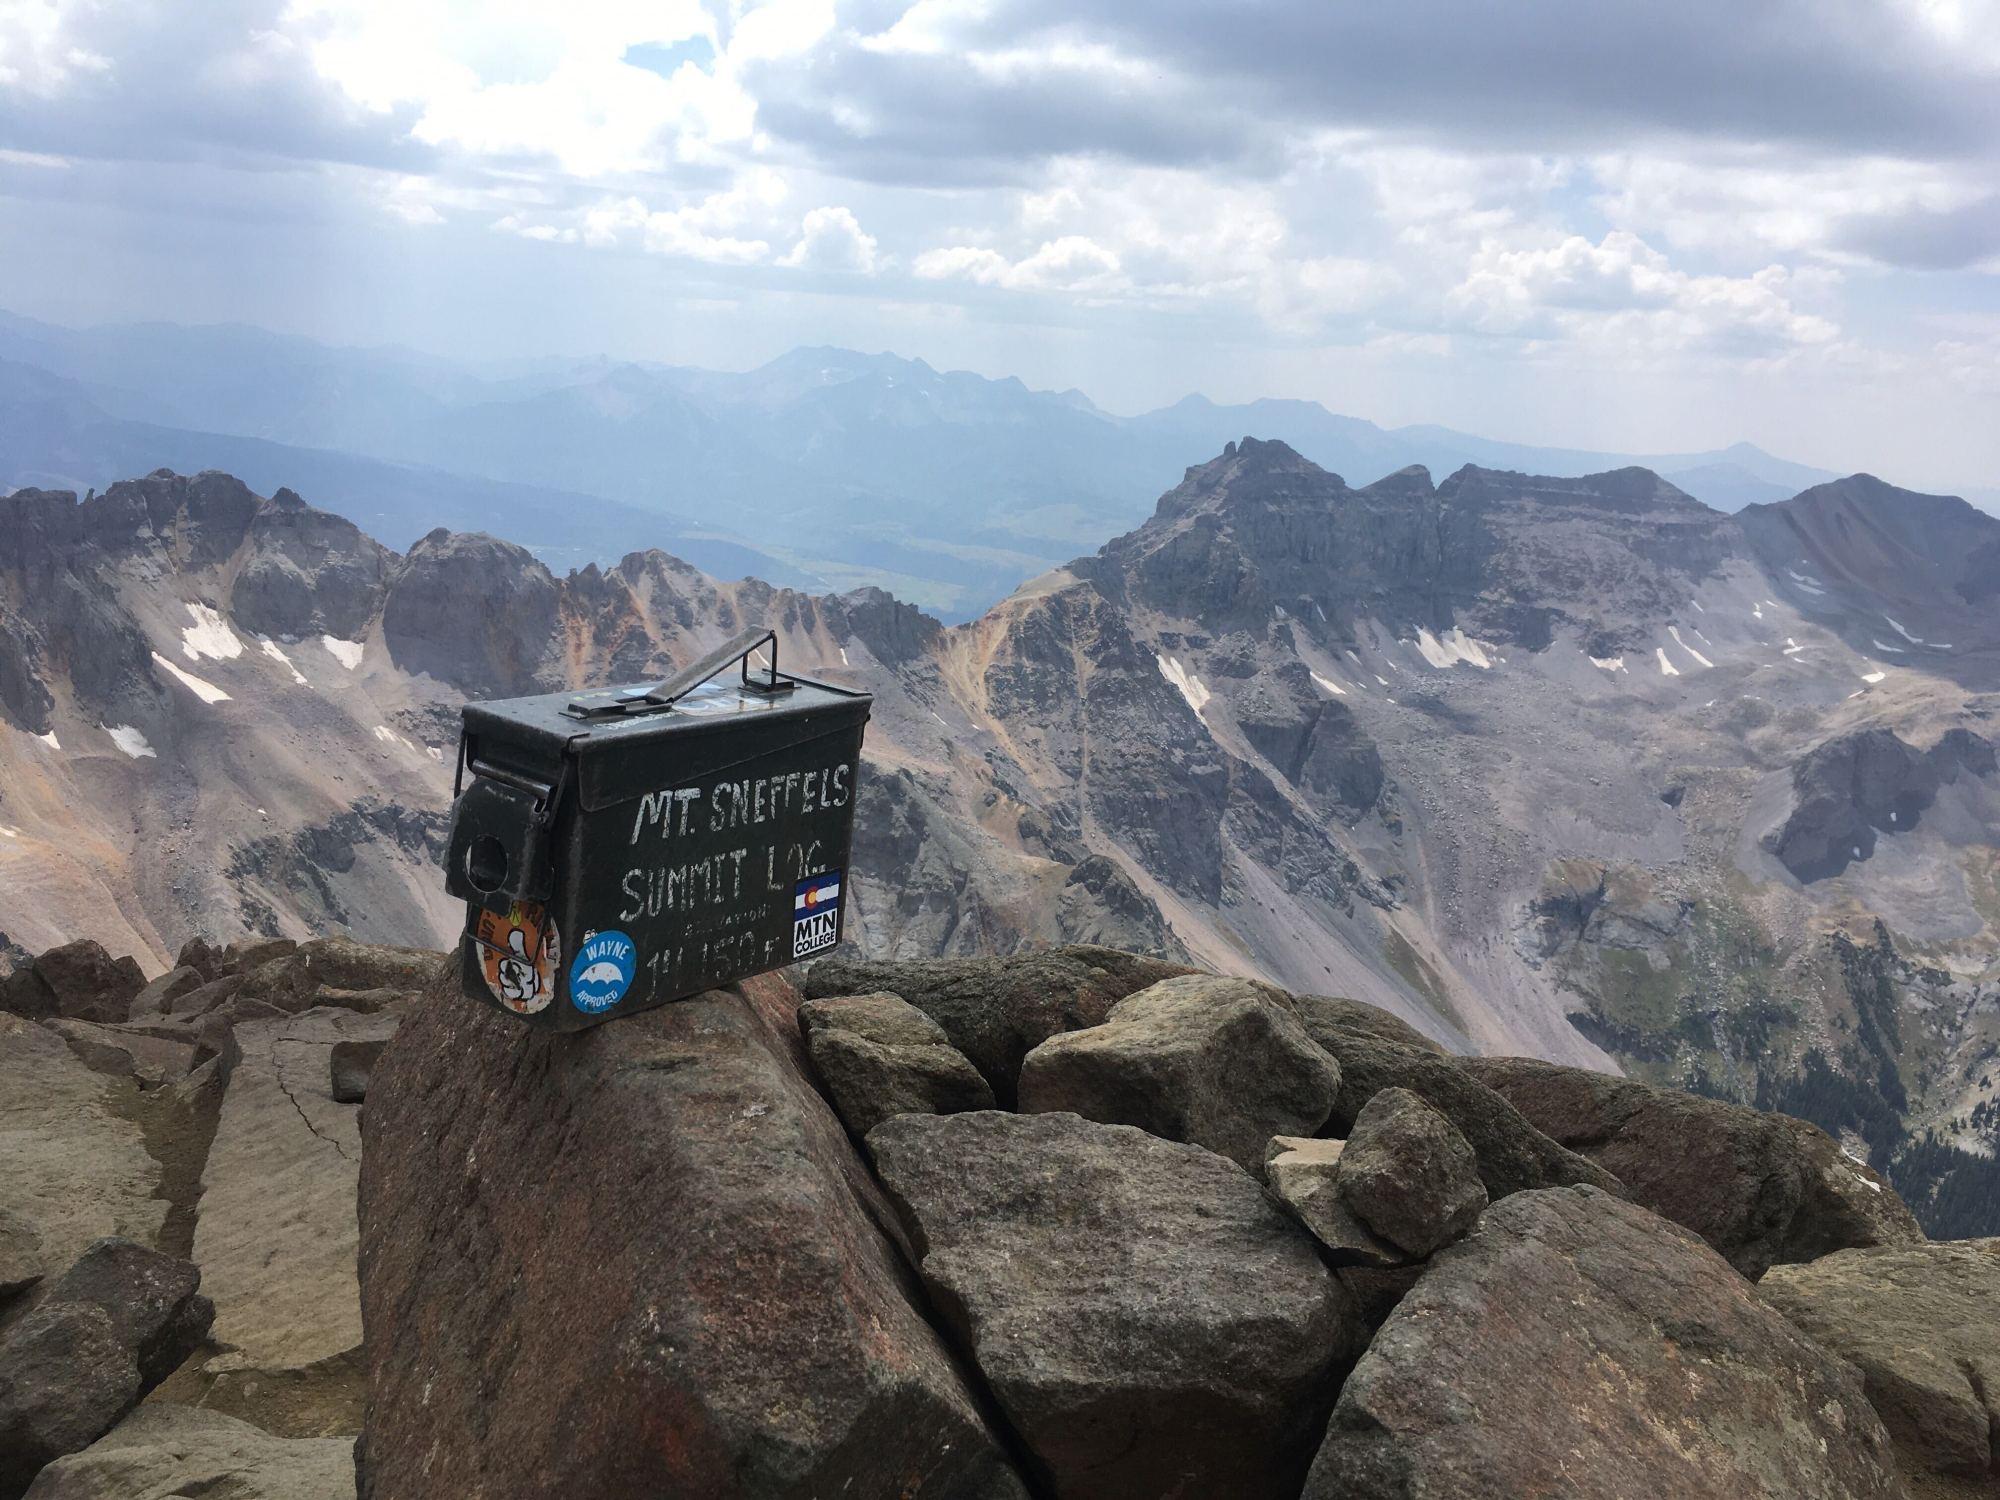 The Summit of Mount Sneffels at 14,150 feet